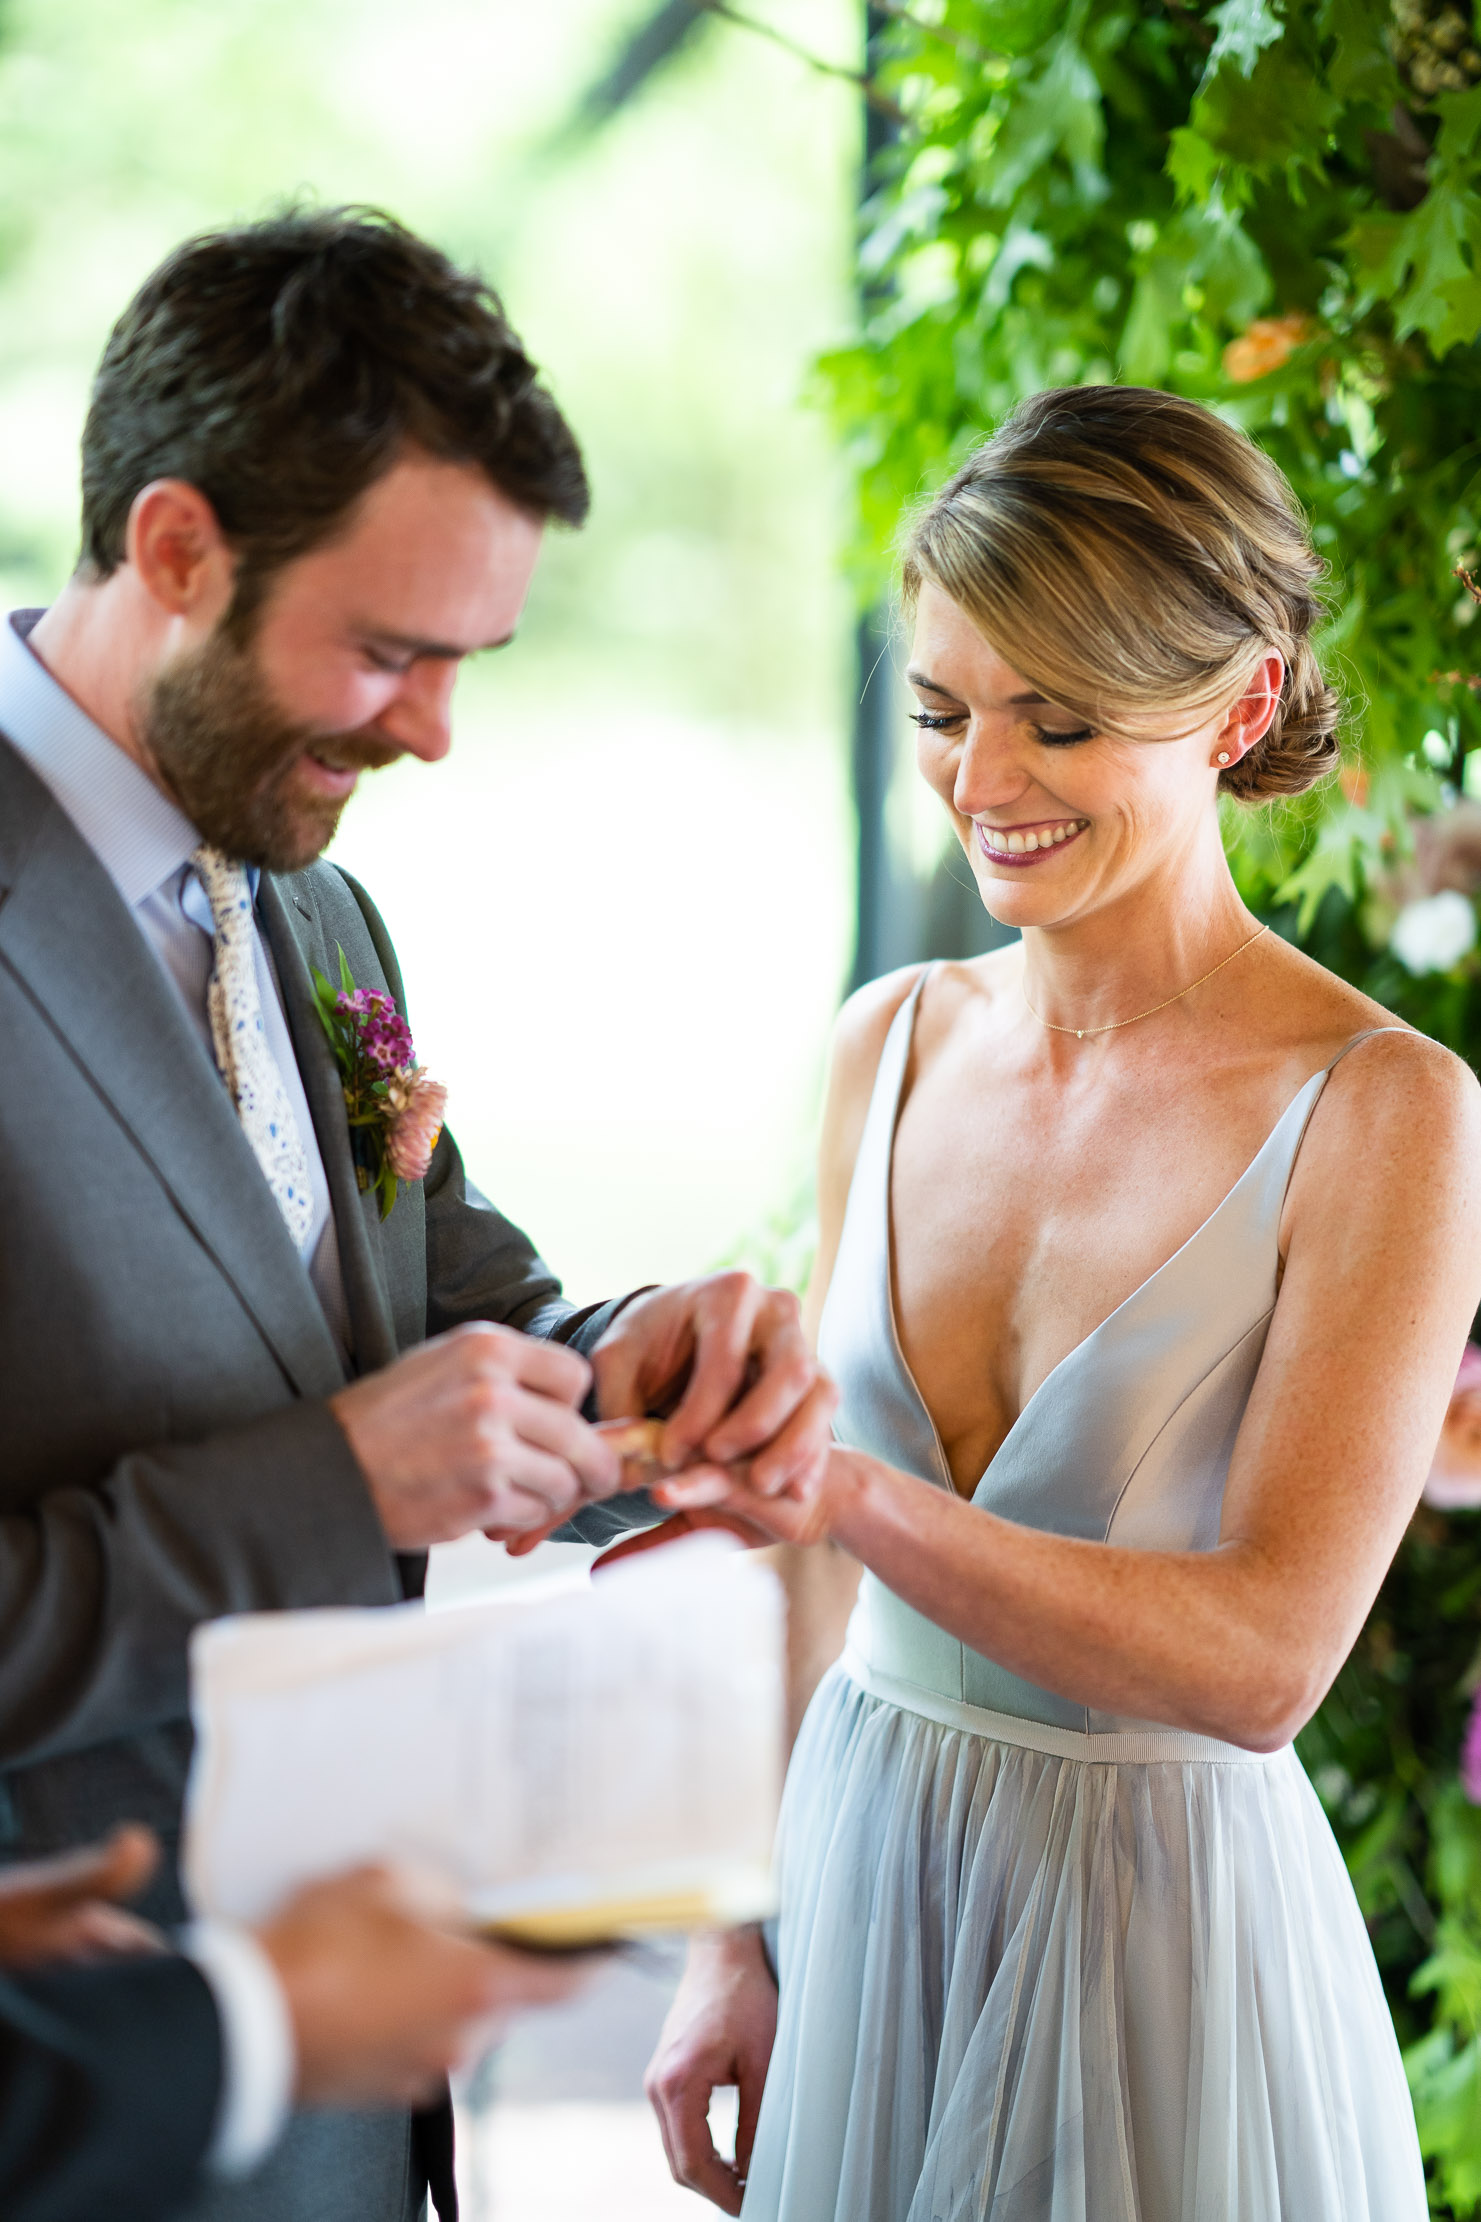 Matties-Green-Pastures-Austin-Wedding-2049.jpg